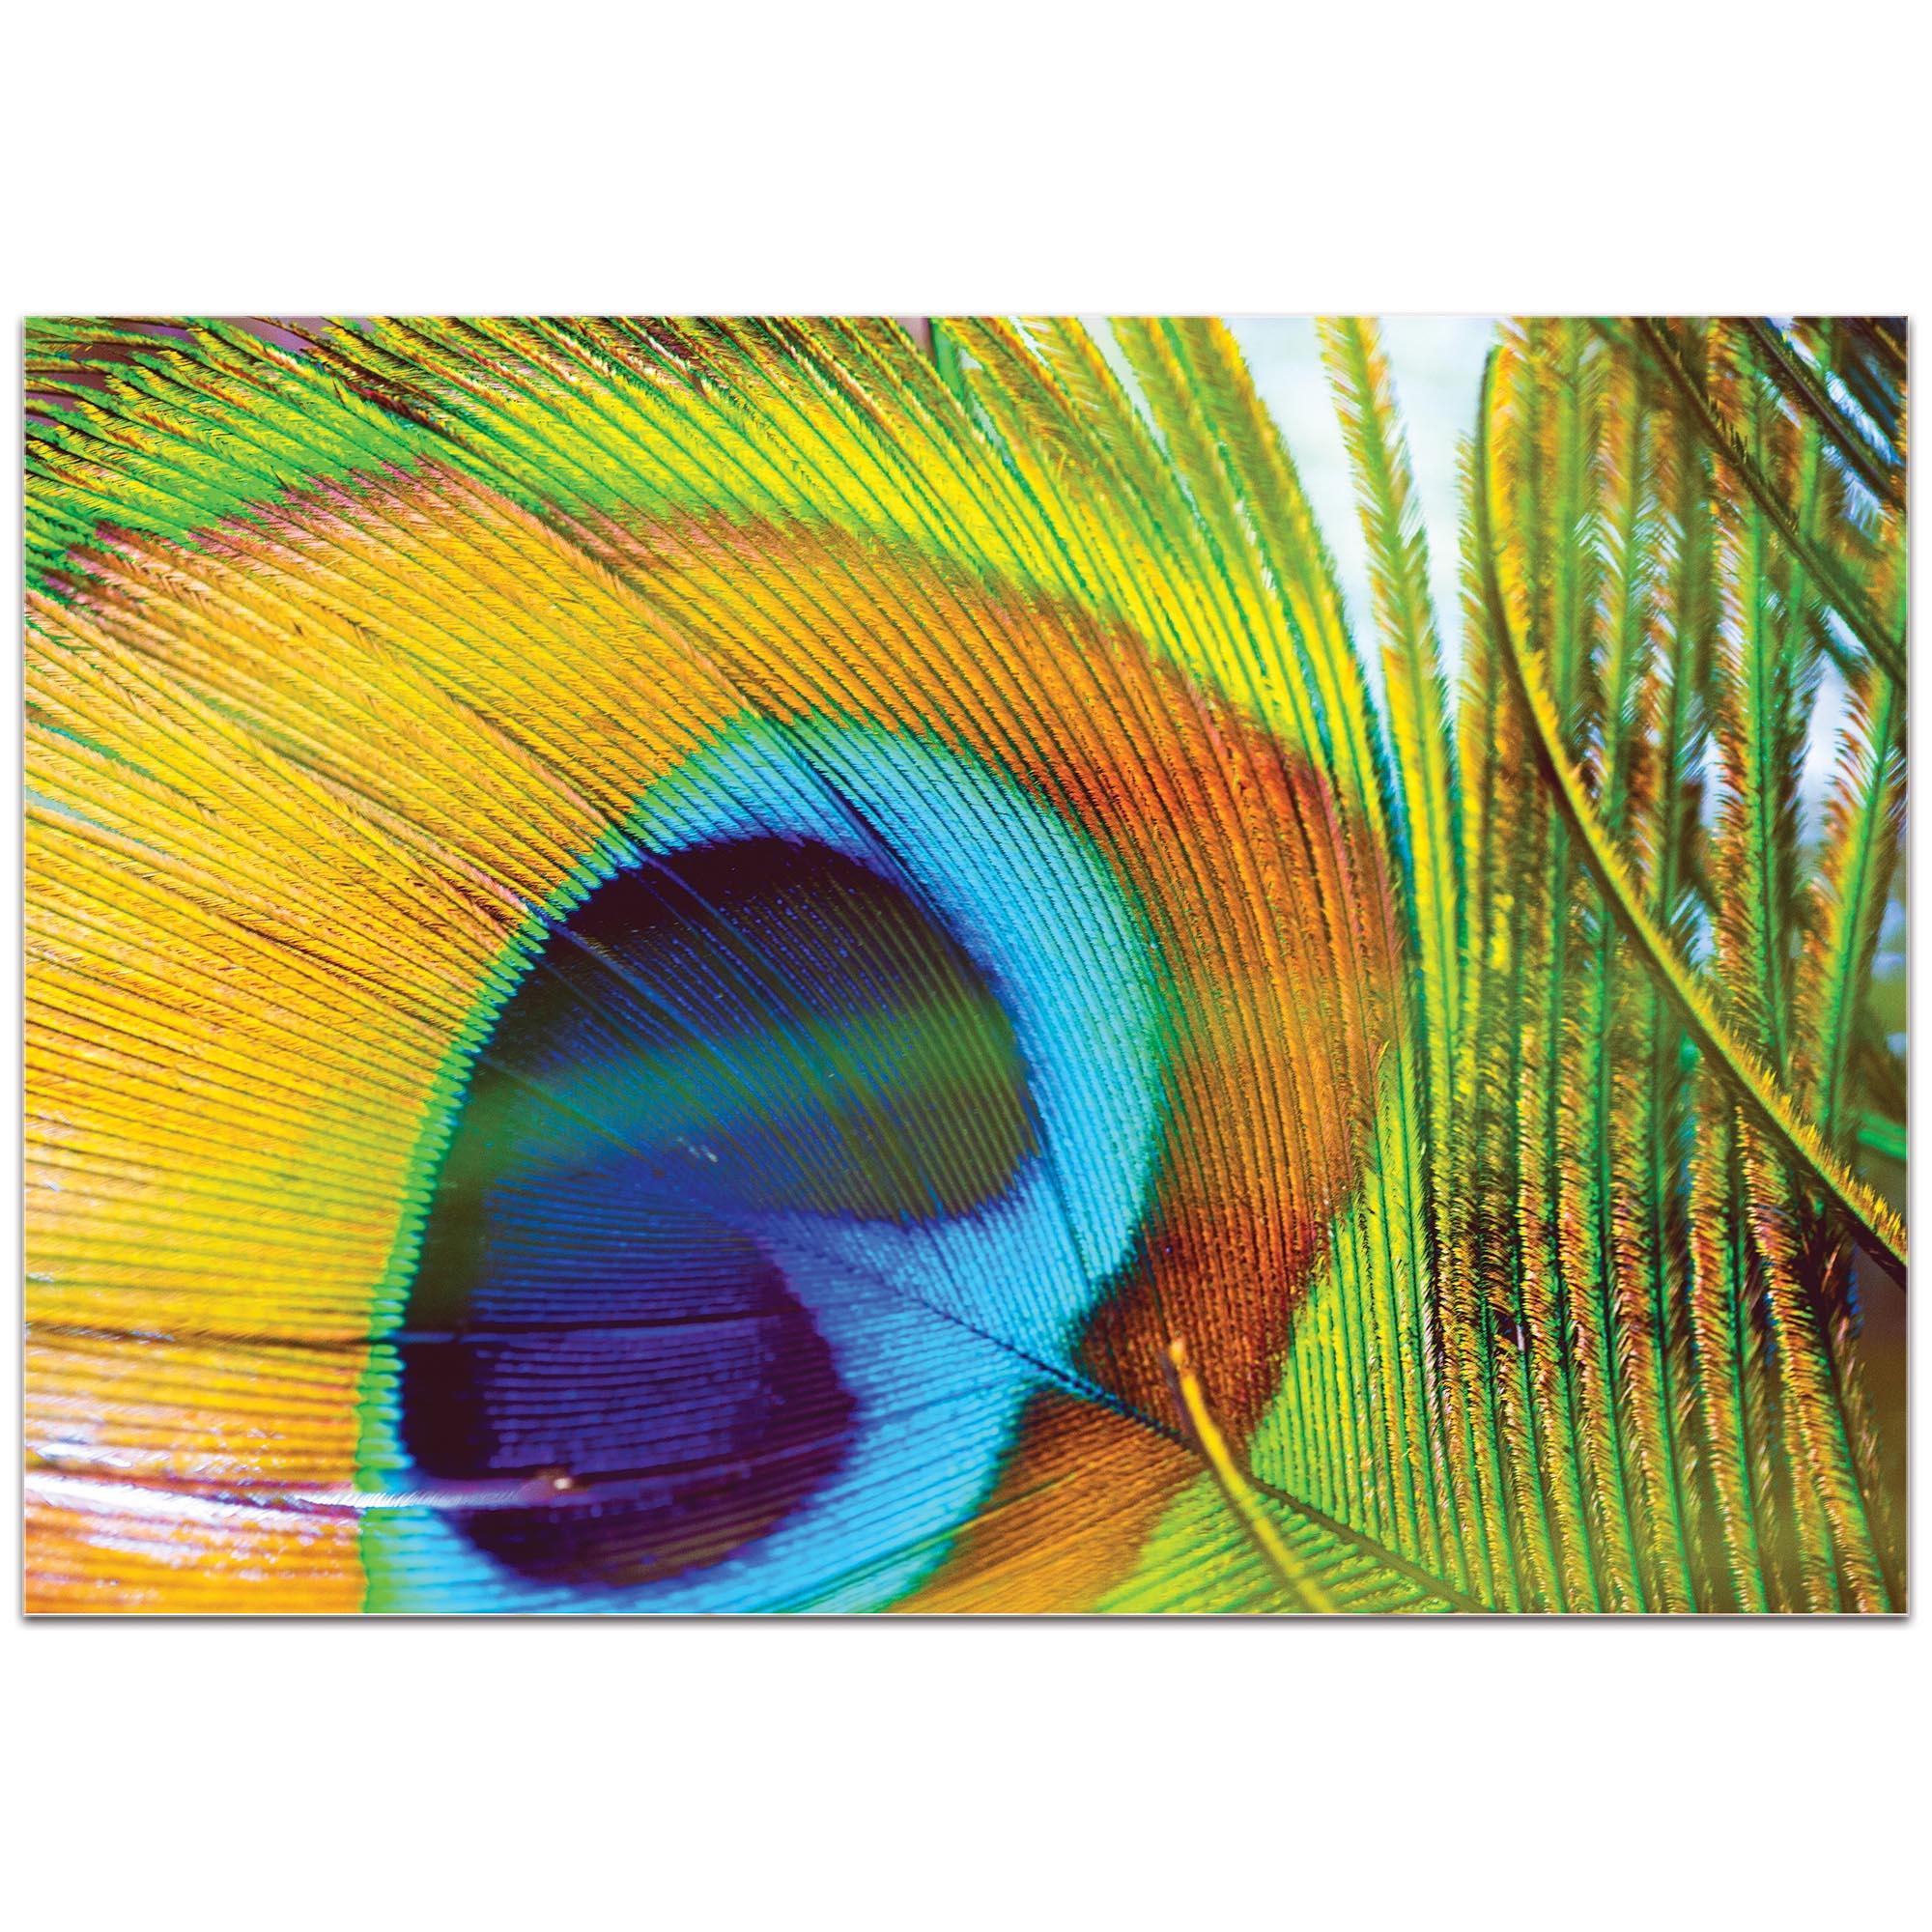 Contemporary Wall Art 'Peacock Colors' - Wildlife Decor on Metal or Plexiglass - Image 2